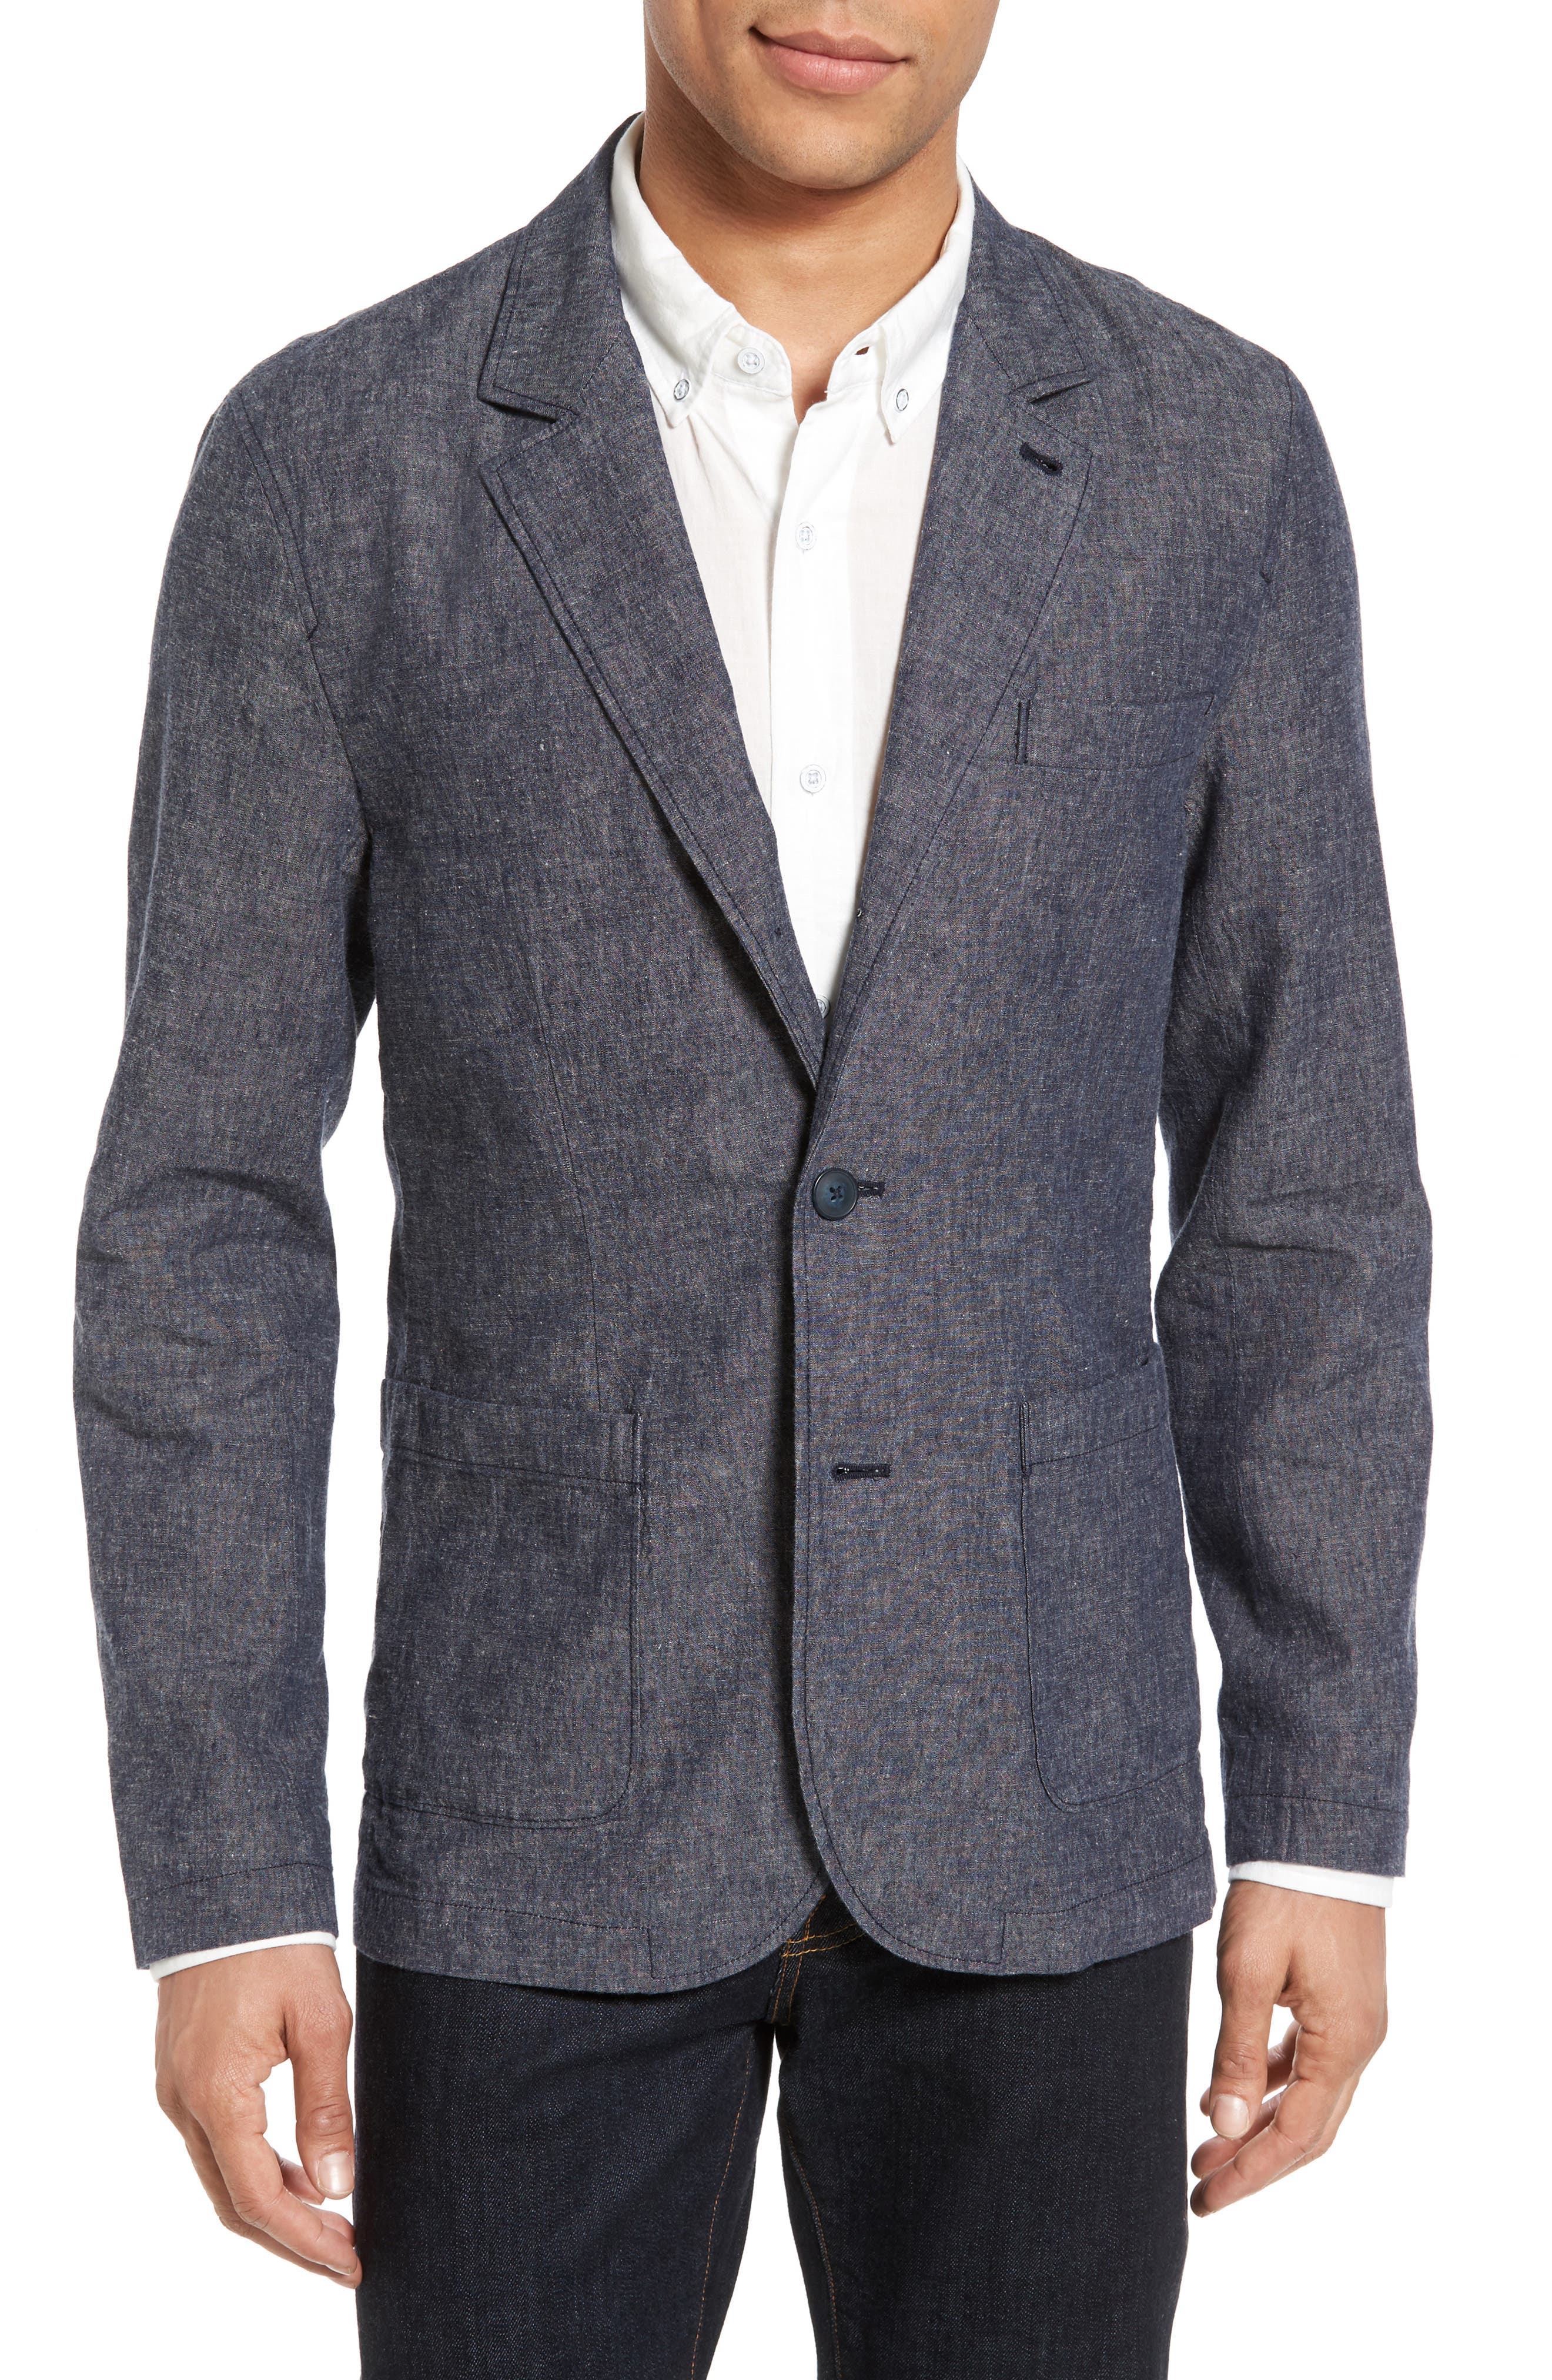 Trunnel Slim Fit Linen Blend Blazer,                         Main,                         color, Night Sea